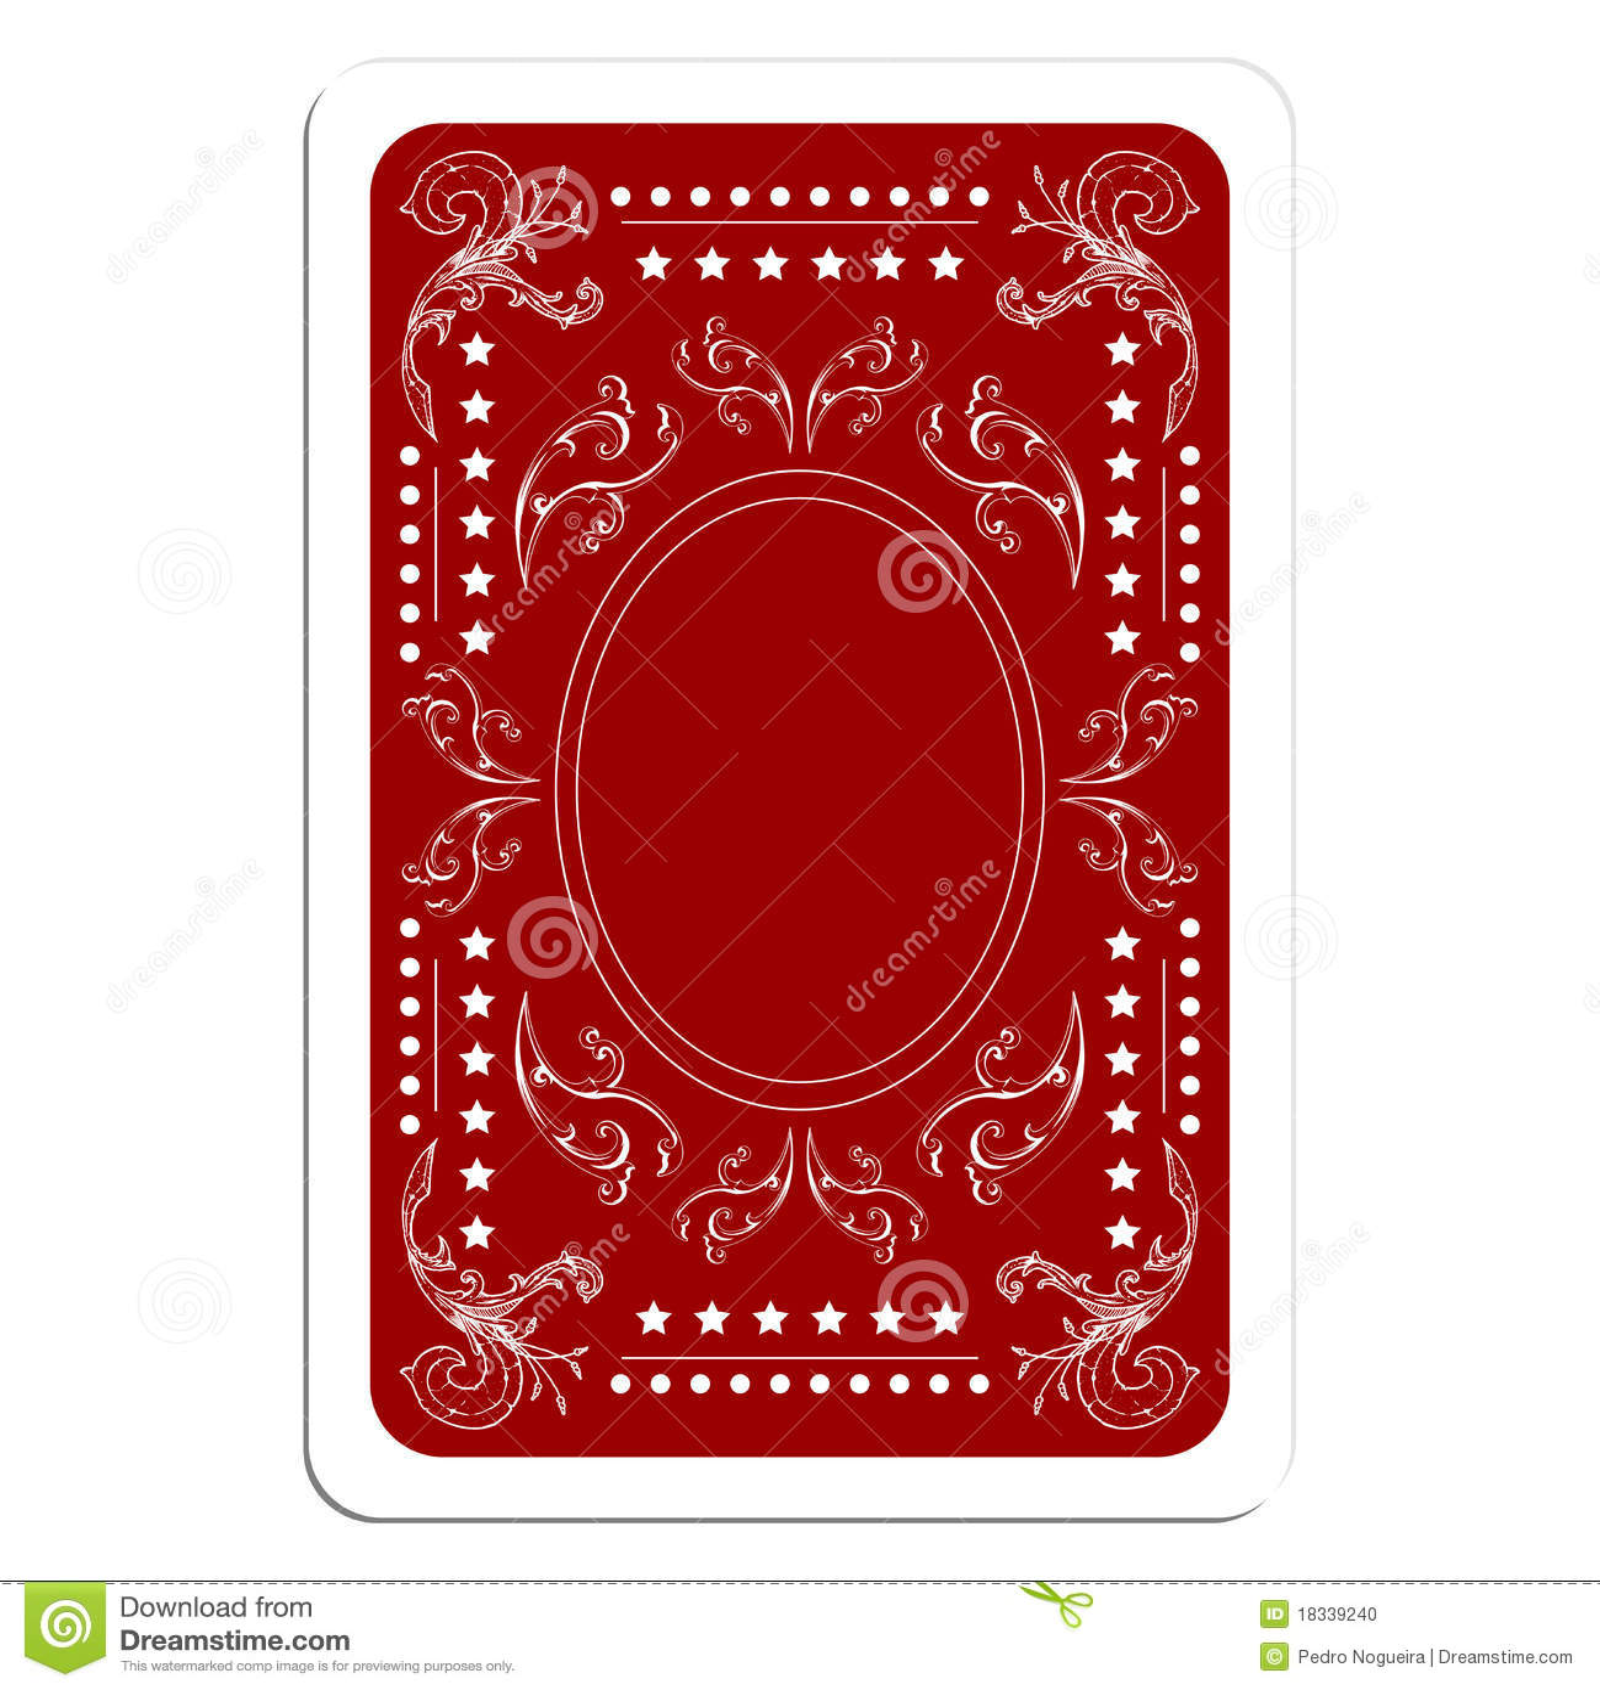 dos de carte de jeu photo stock image 18339240. Black Bedroom Furniture Sets. Home Design Ideas